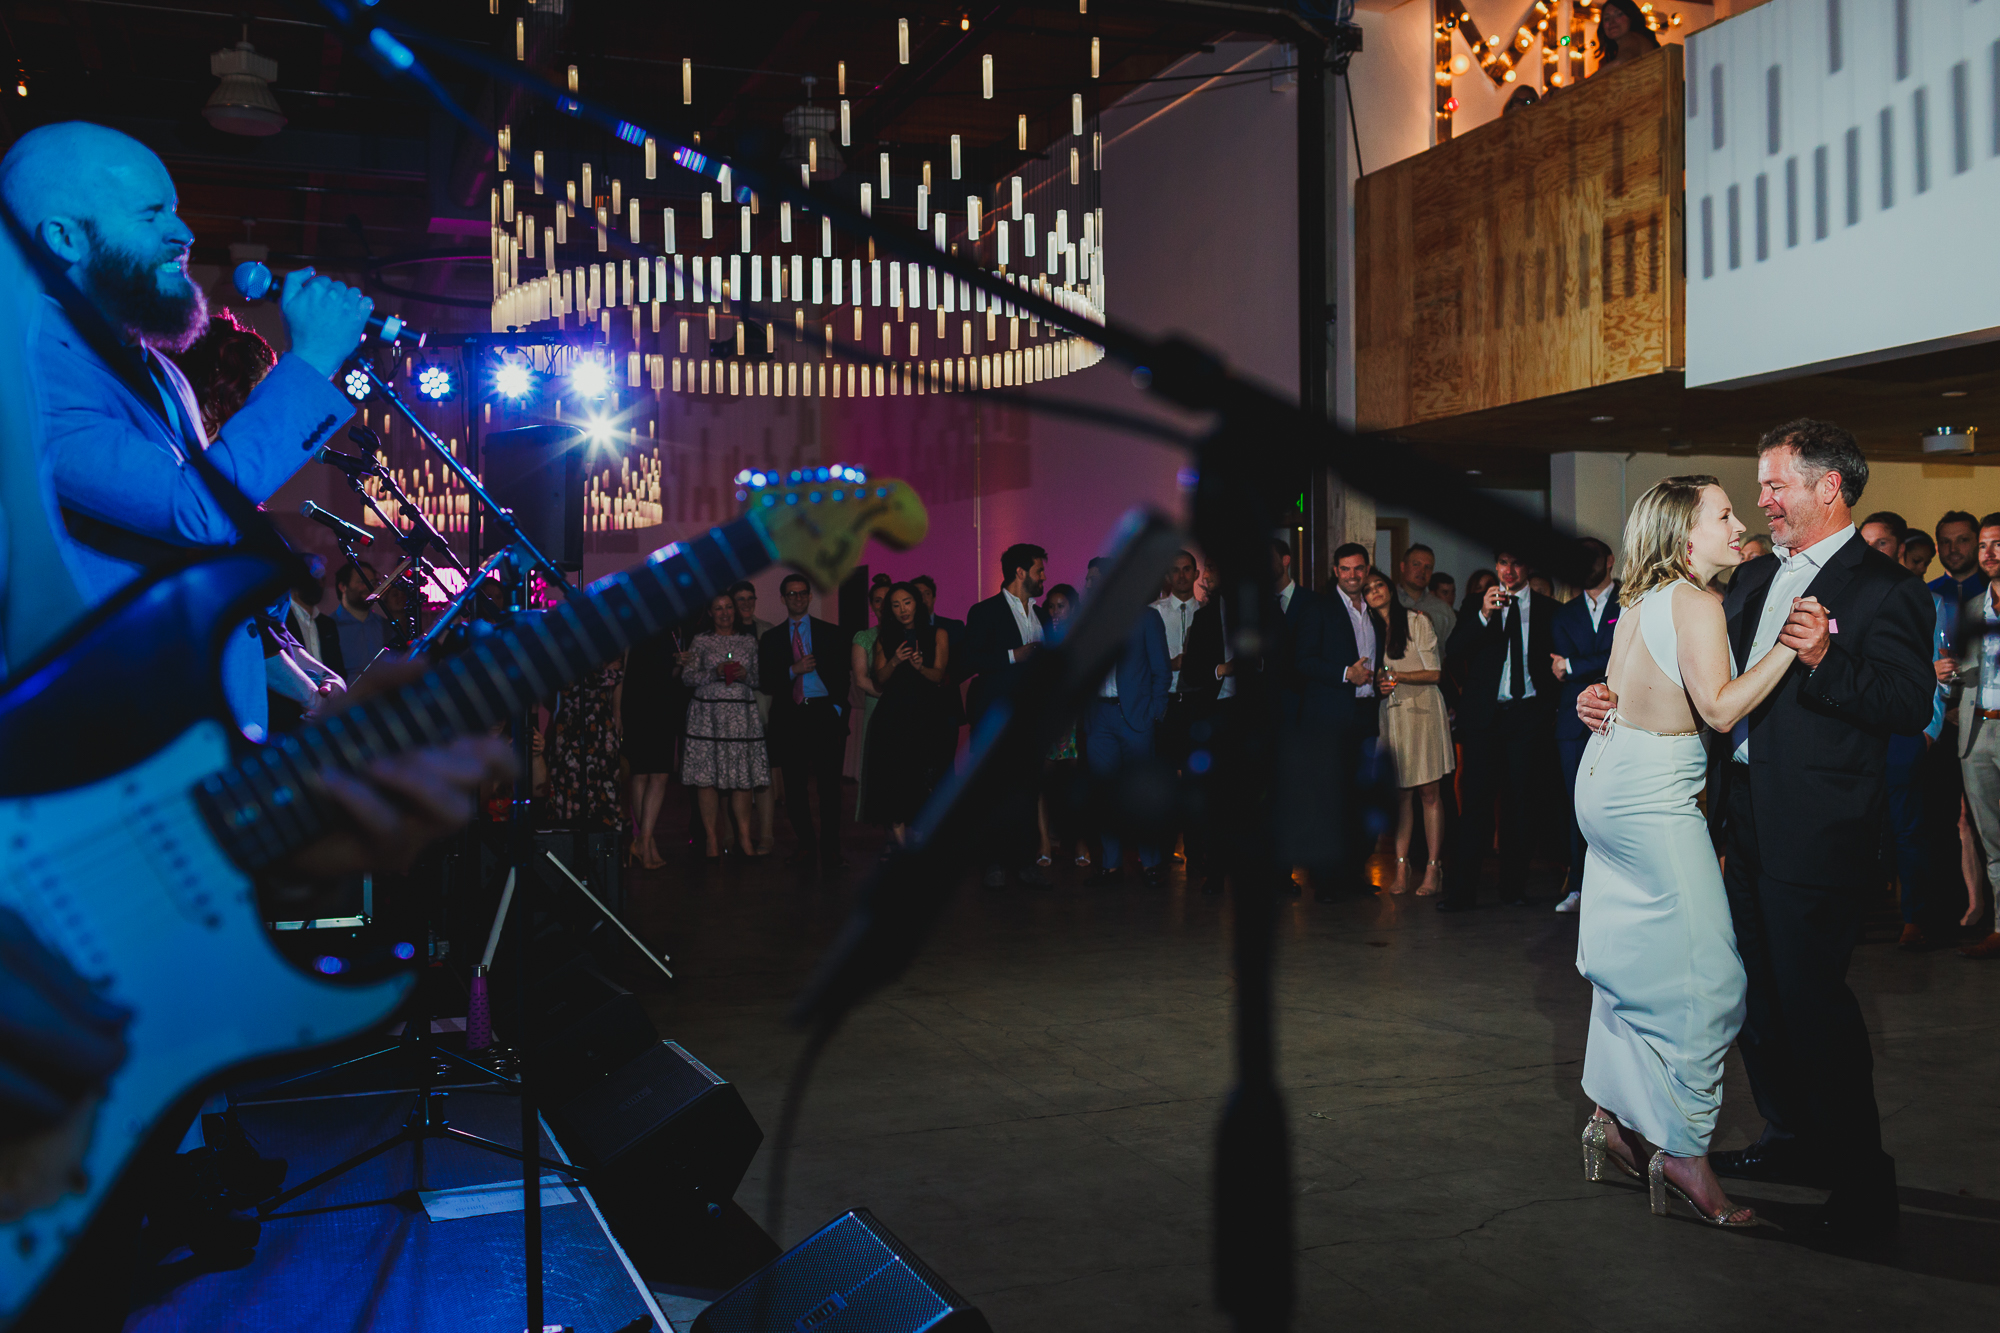 canvas event space wedding photos by Krista Welch-0107.jpg